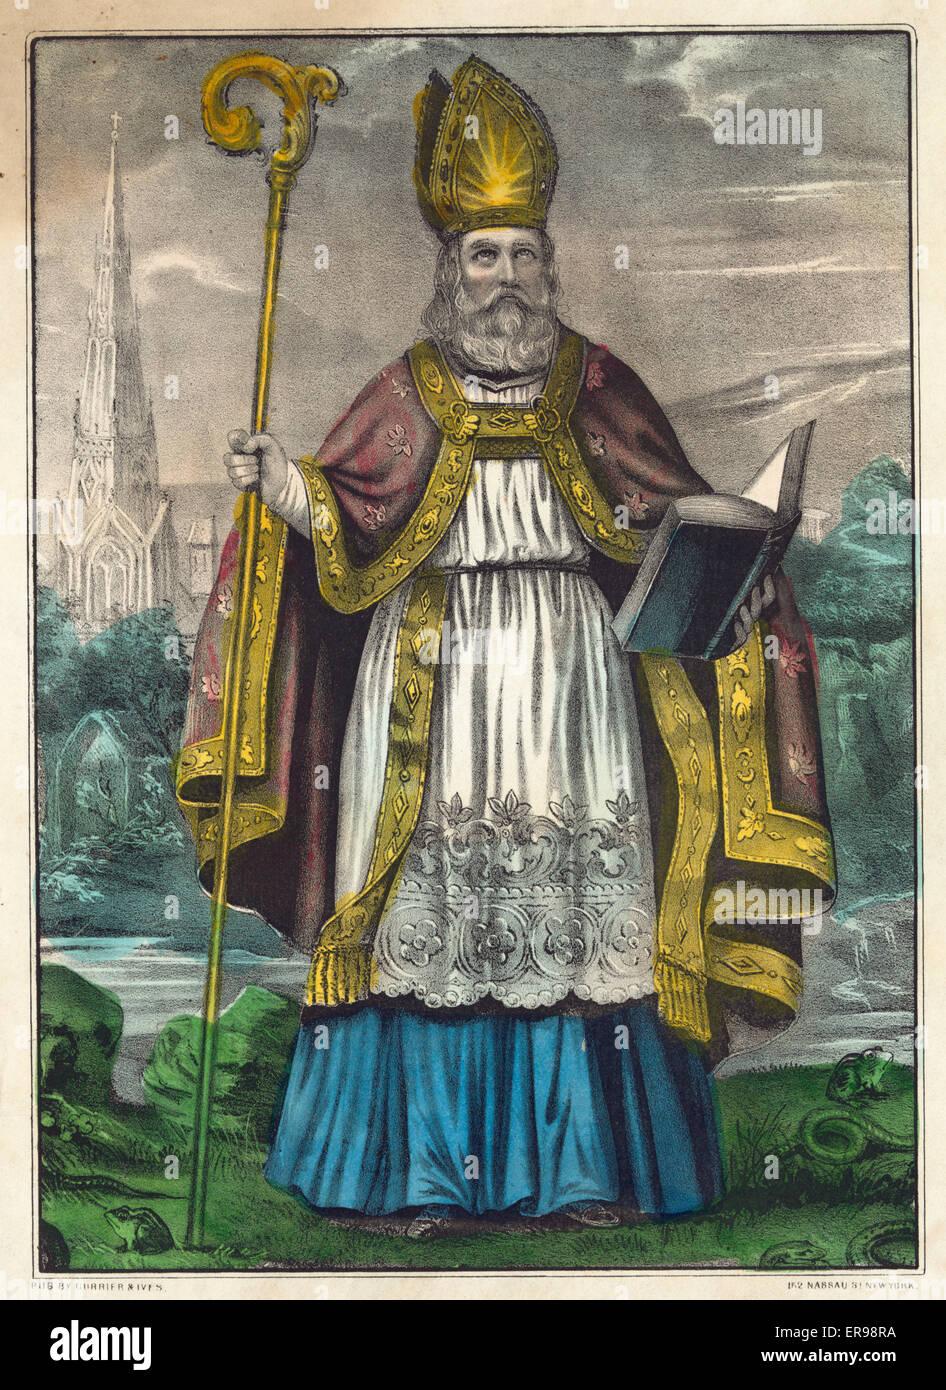 The Apostle of Ireland St. Patrick: born A.D. 372, died A.D. 464. Serpentes et omnia venenata animalia ex Hibernia Stock Photo